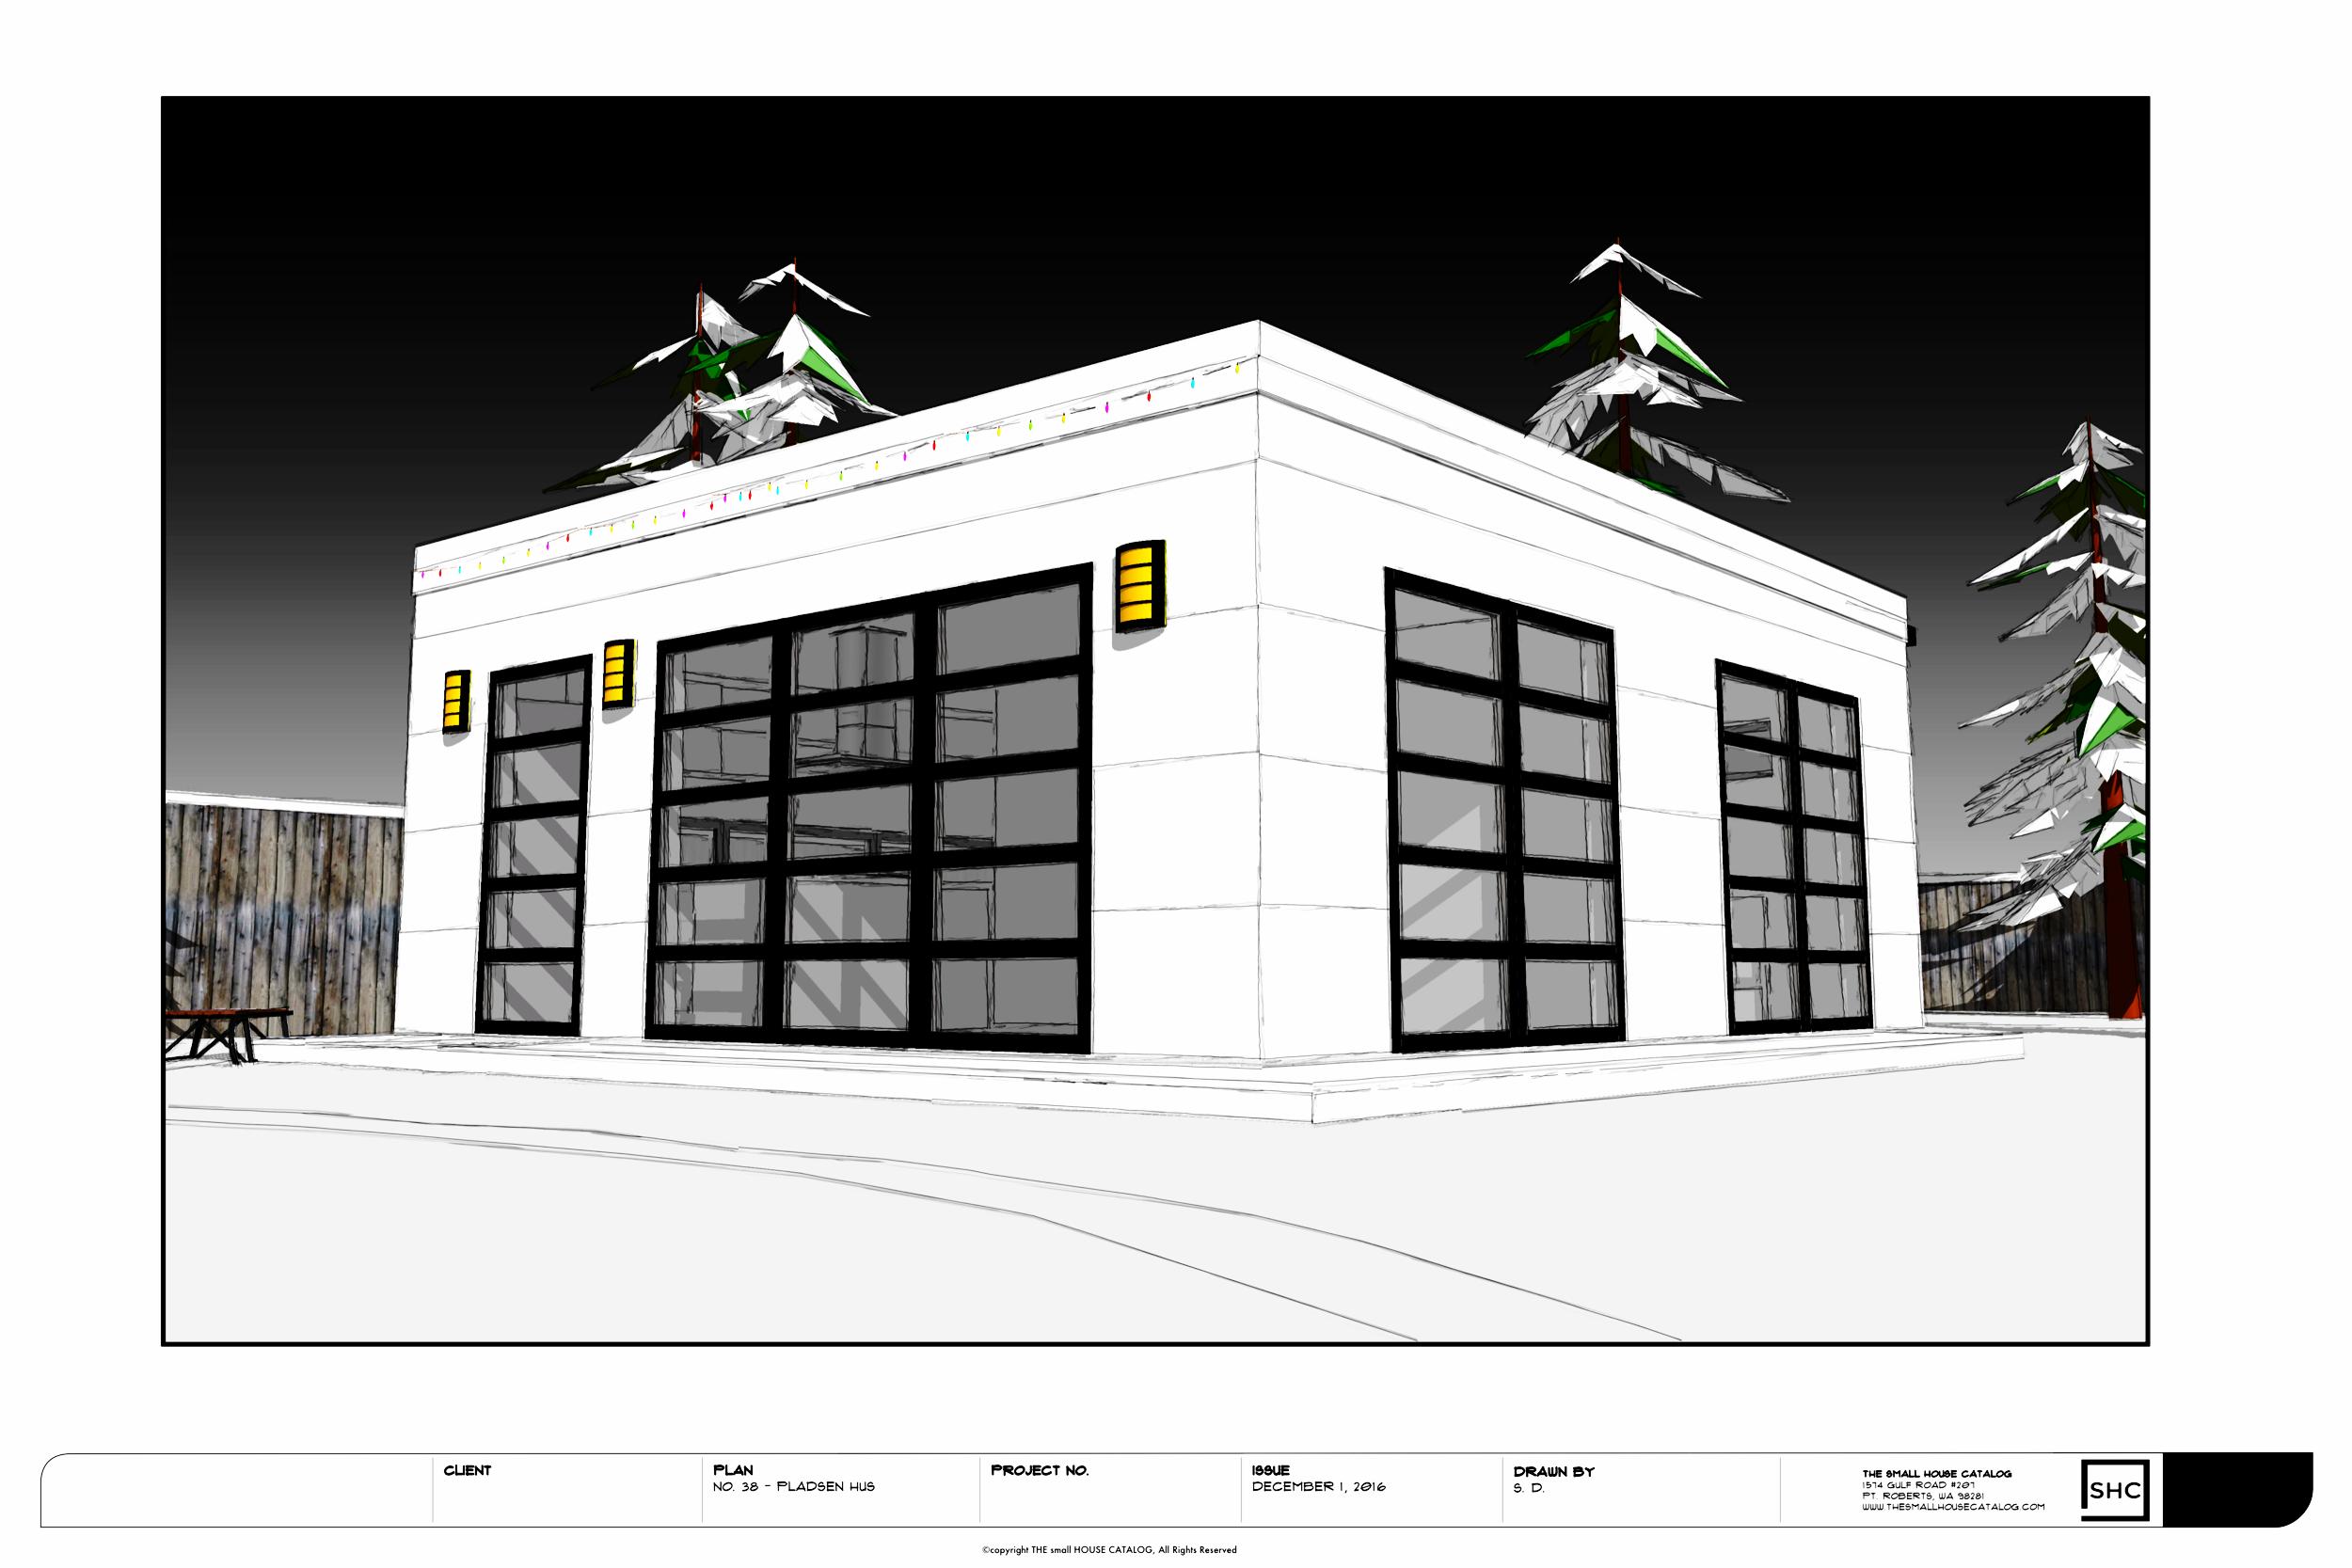 Collaborative Design Bedrooms 1 Bathrooms 3 4 Floors 1